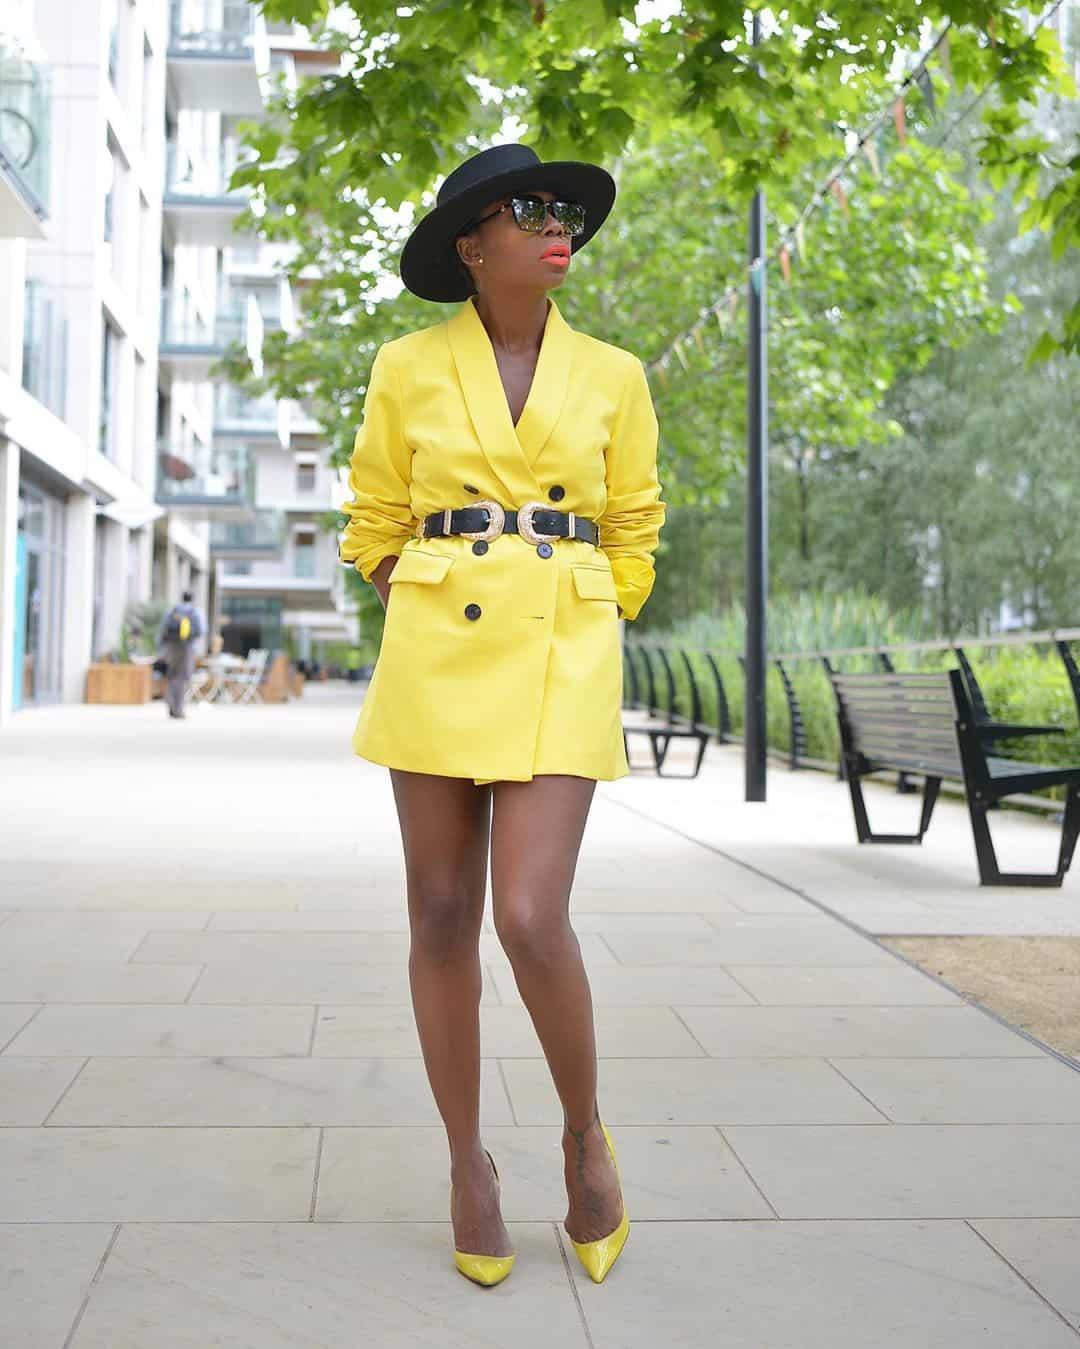 Fashionista style